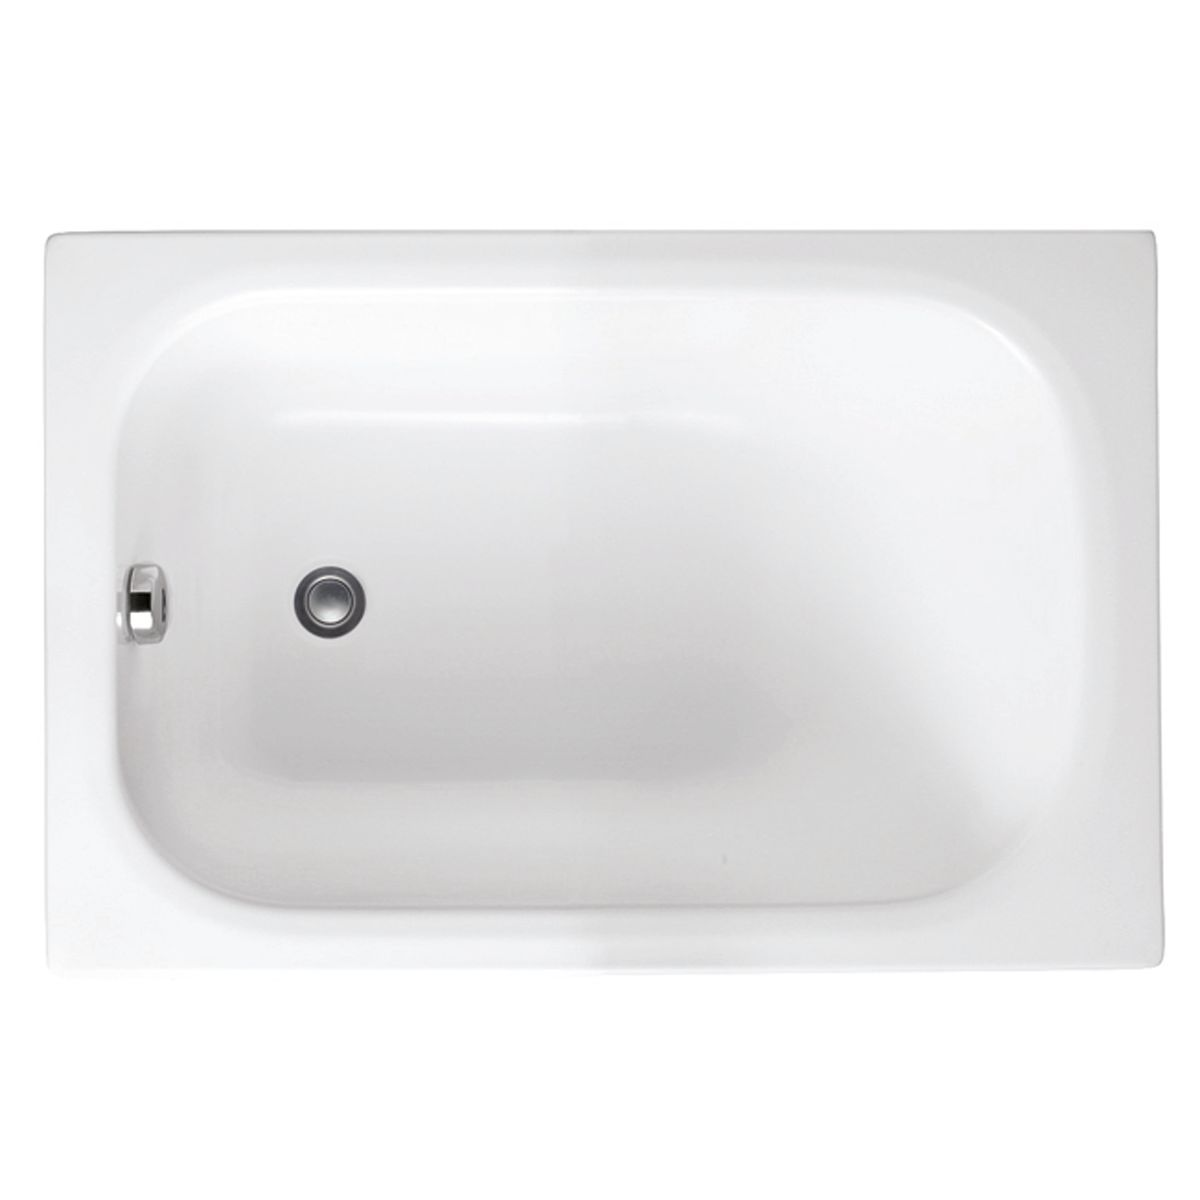 Vasche ad angolo prezzi vasca da bagno con piedini shropshire x cm bianco with vasche ad angolo - Vasca da bagno 100x70 ...